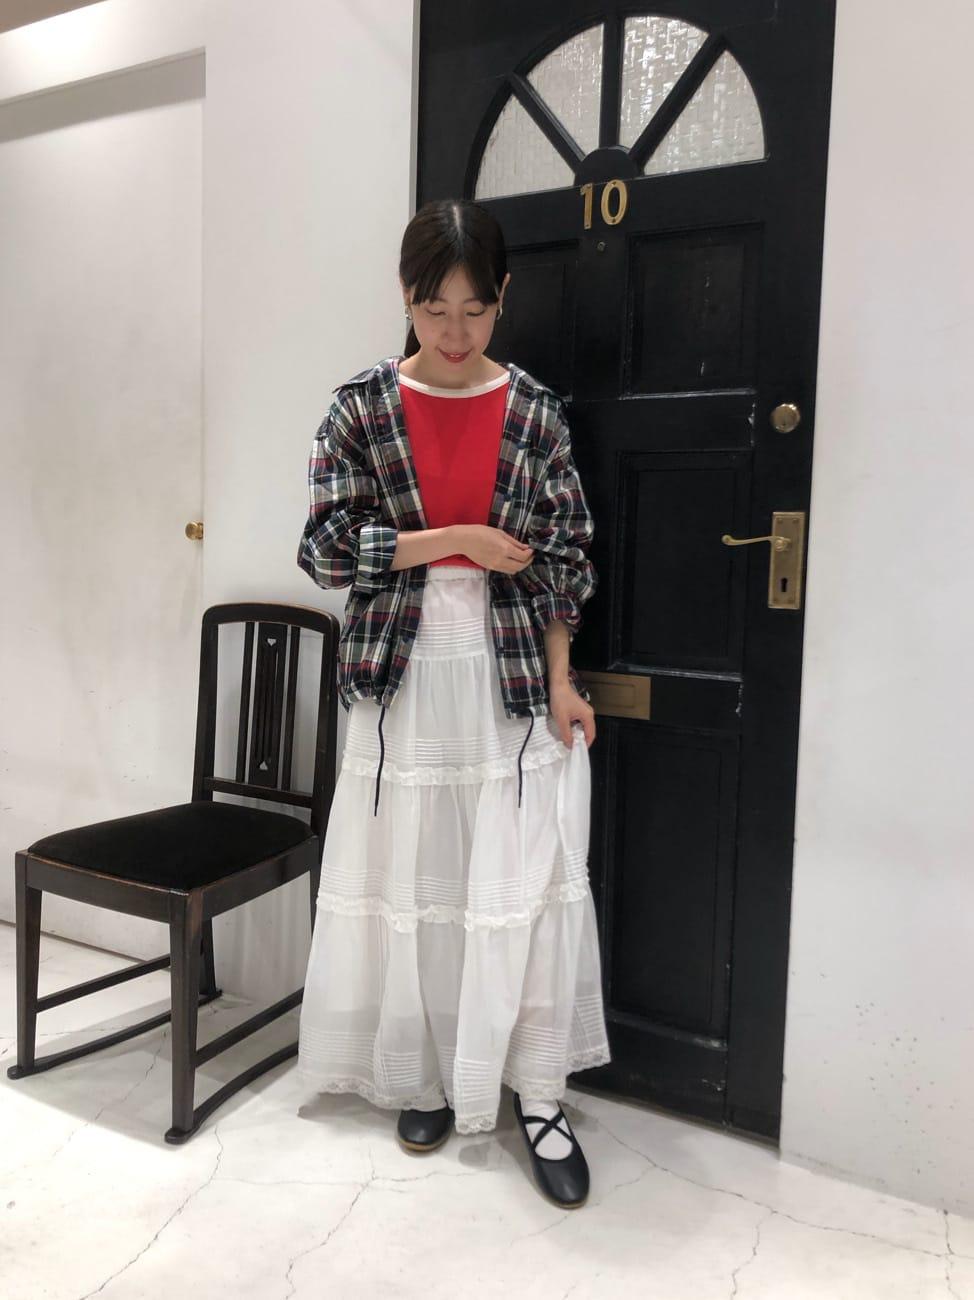 Dot and Stripes CHILD WOMAN ルクアイーレ 身長:151cm 2021.08.17